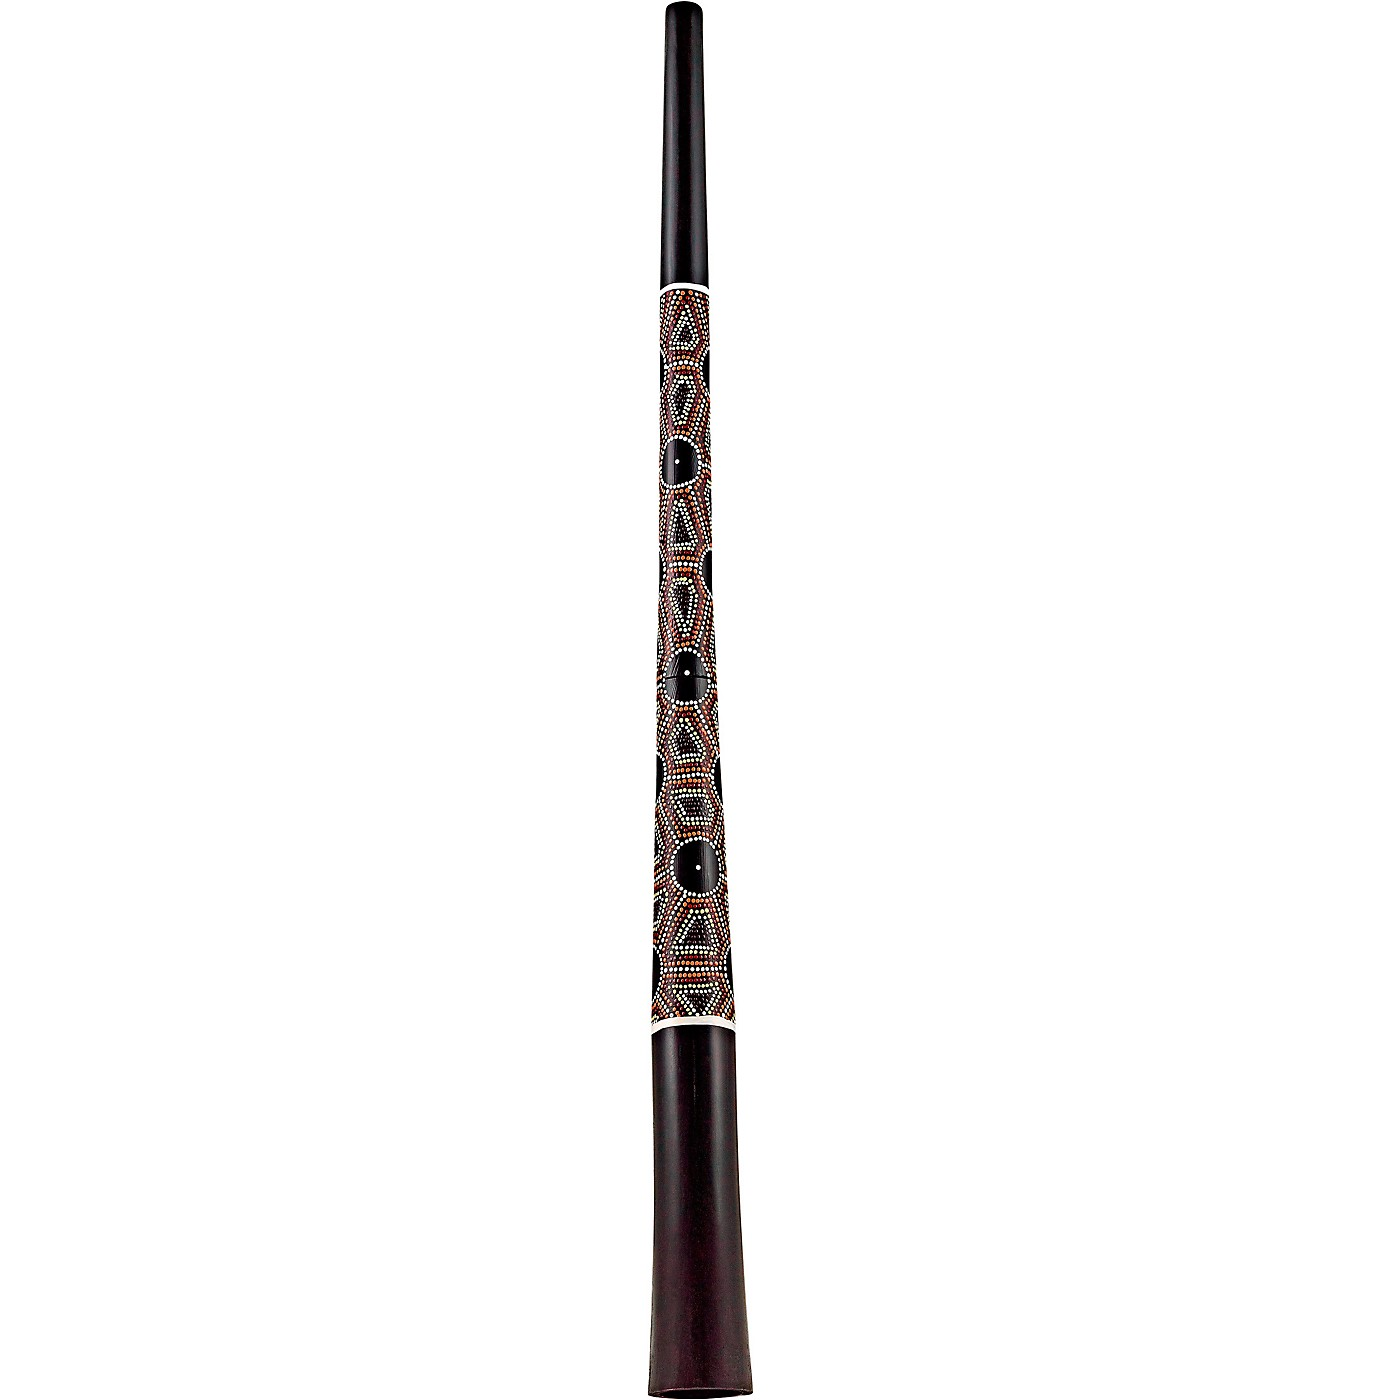 Meinl Sonic Energy Sliced Pro Didgeridoo, Note E thumbnail